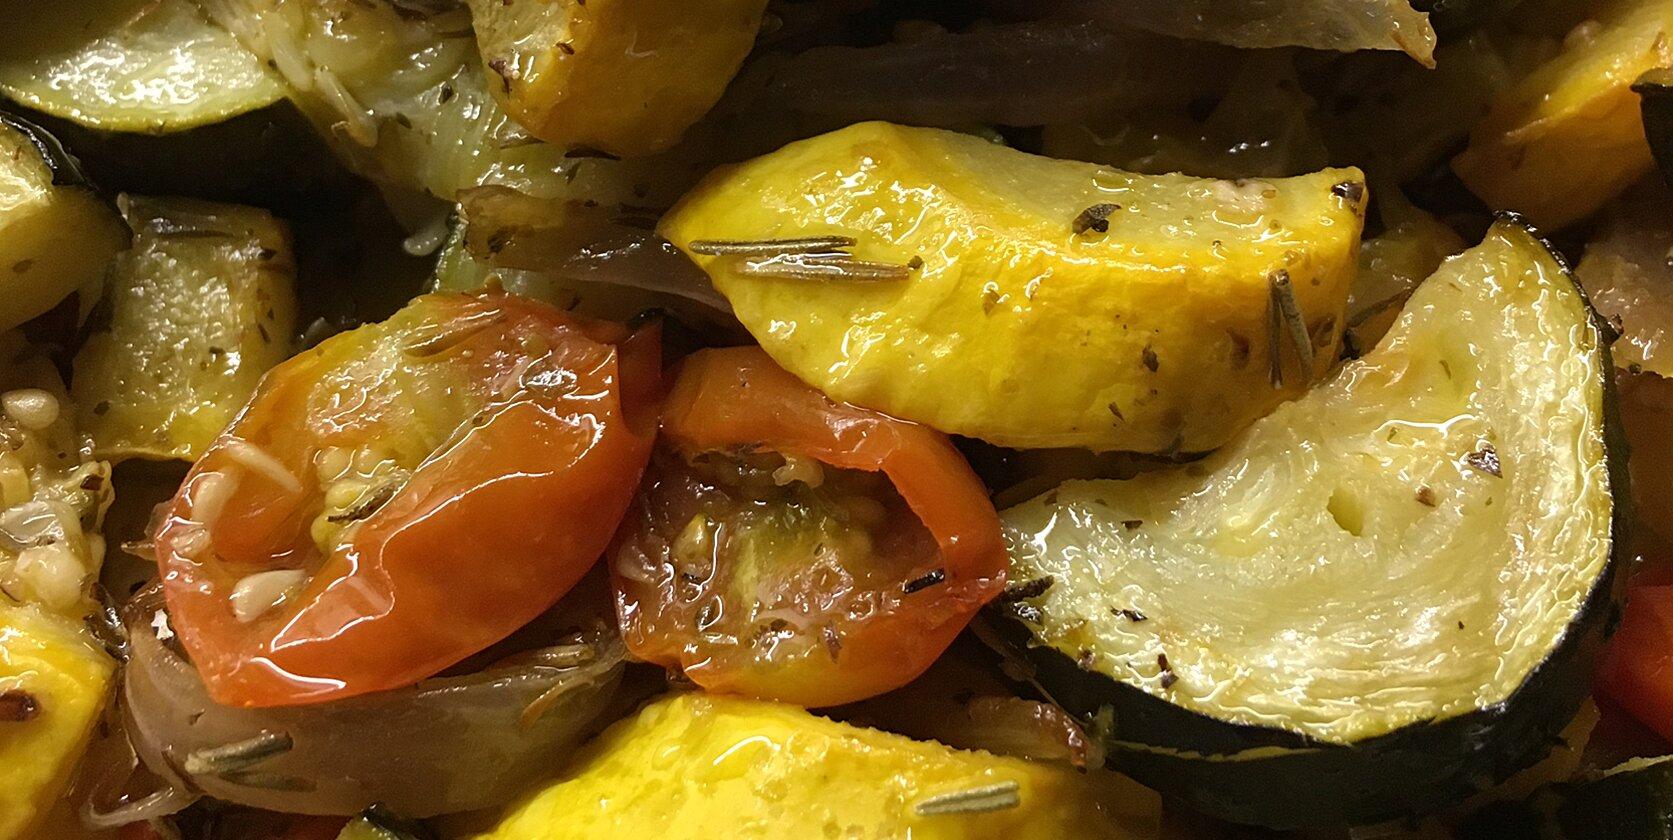 sheet pan roasted vegetables recipe